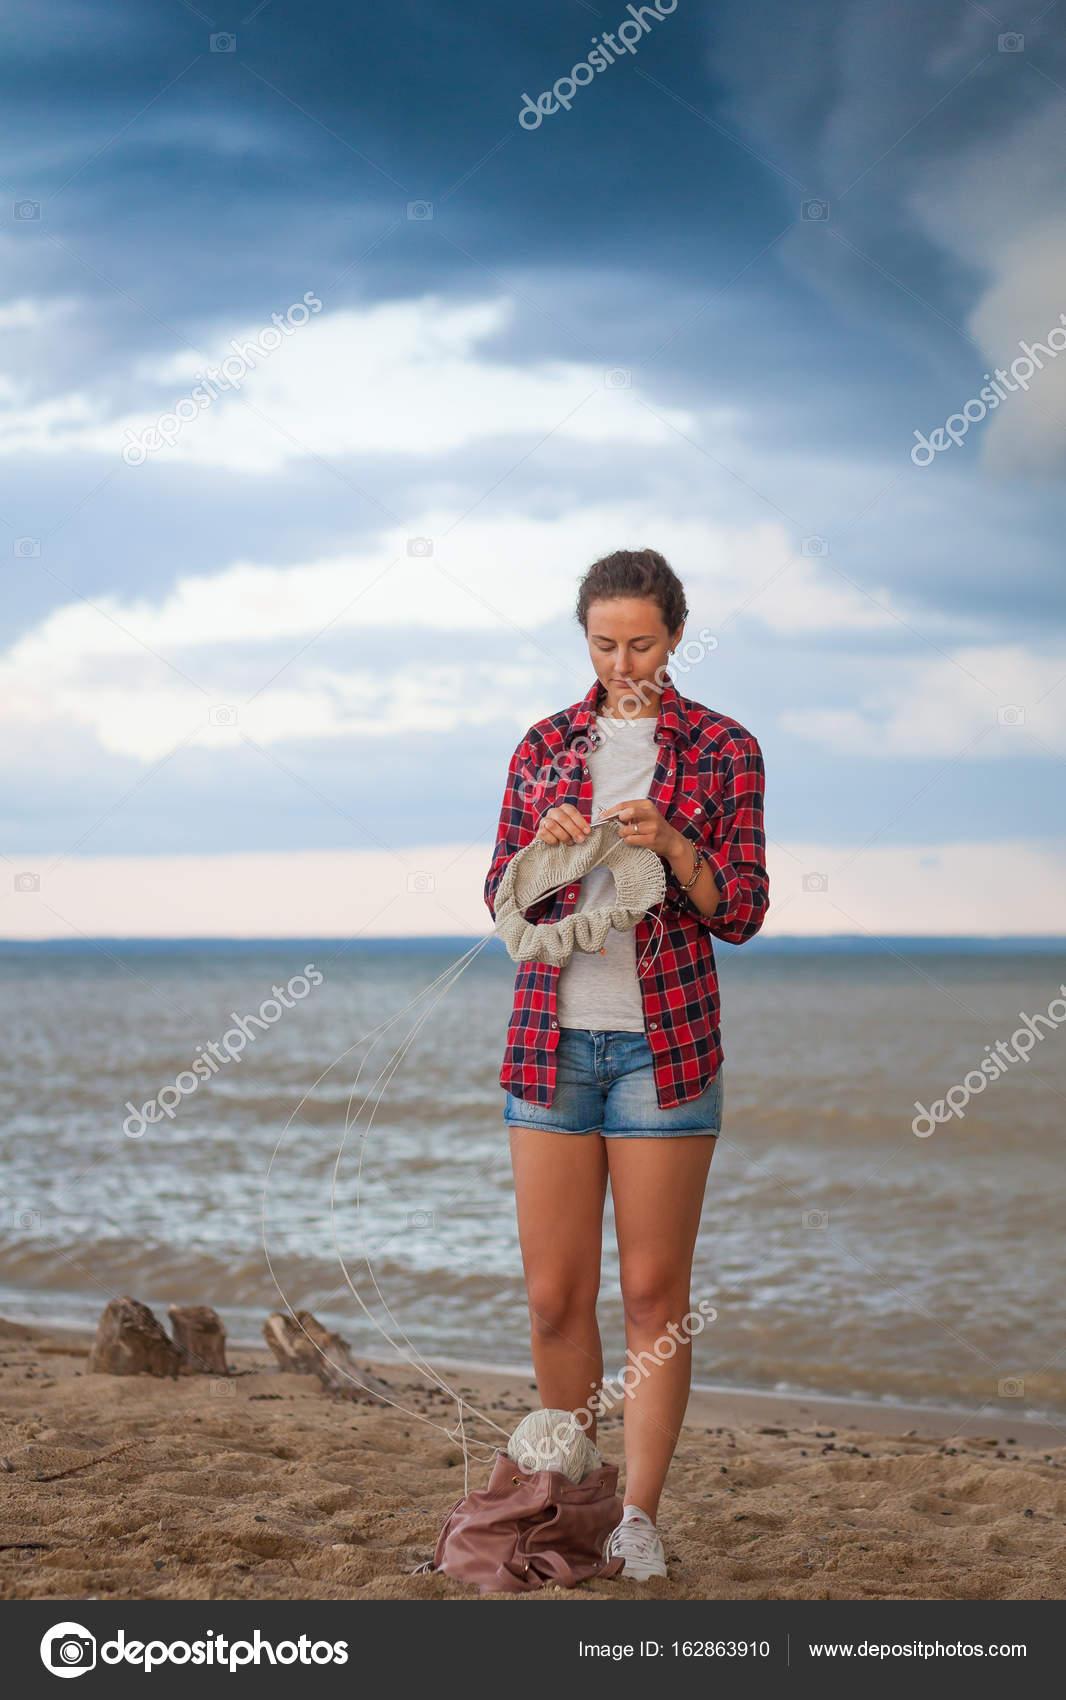 c82b3bc3781a ... πλεκτά με βελόνες πλεξίματος ένα γκρι πουλόβερ που γίνονται από φυσικό  νήμα μάλλινο πουλόβερ και στέκεται πάνω στην άμμο κοντά στη θάλασσα — Εικόνα  ...